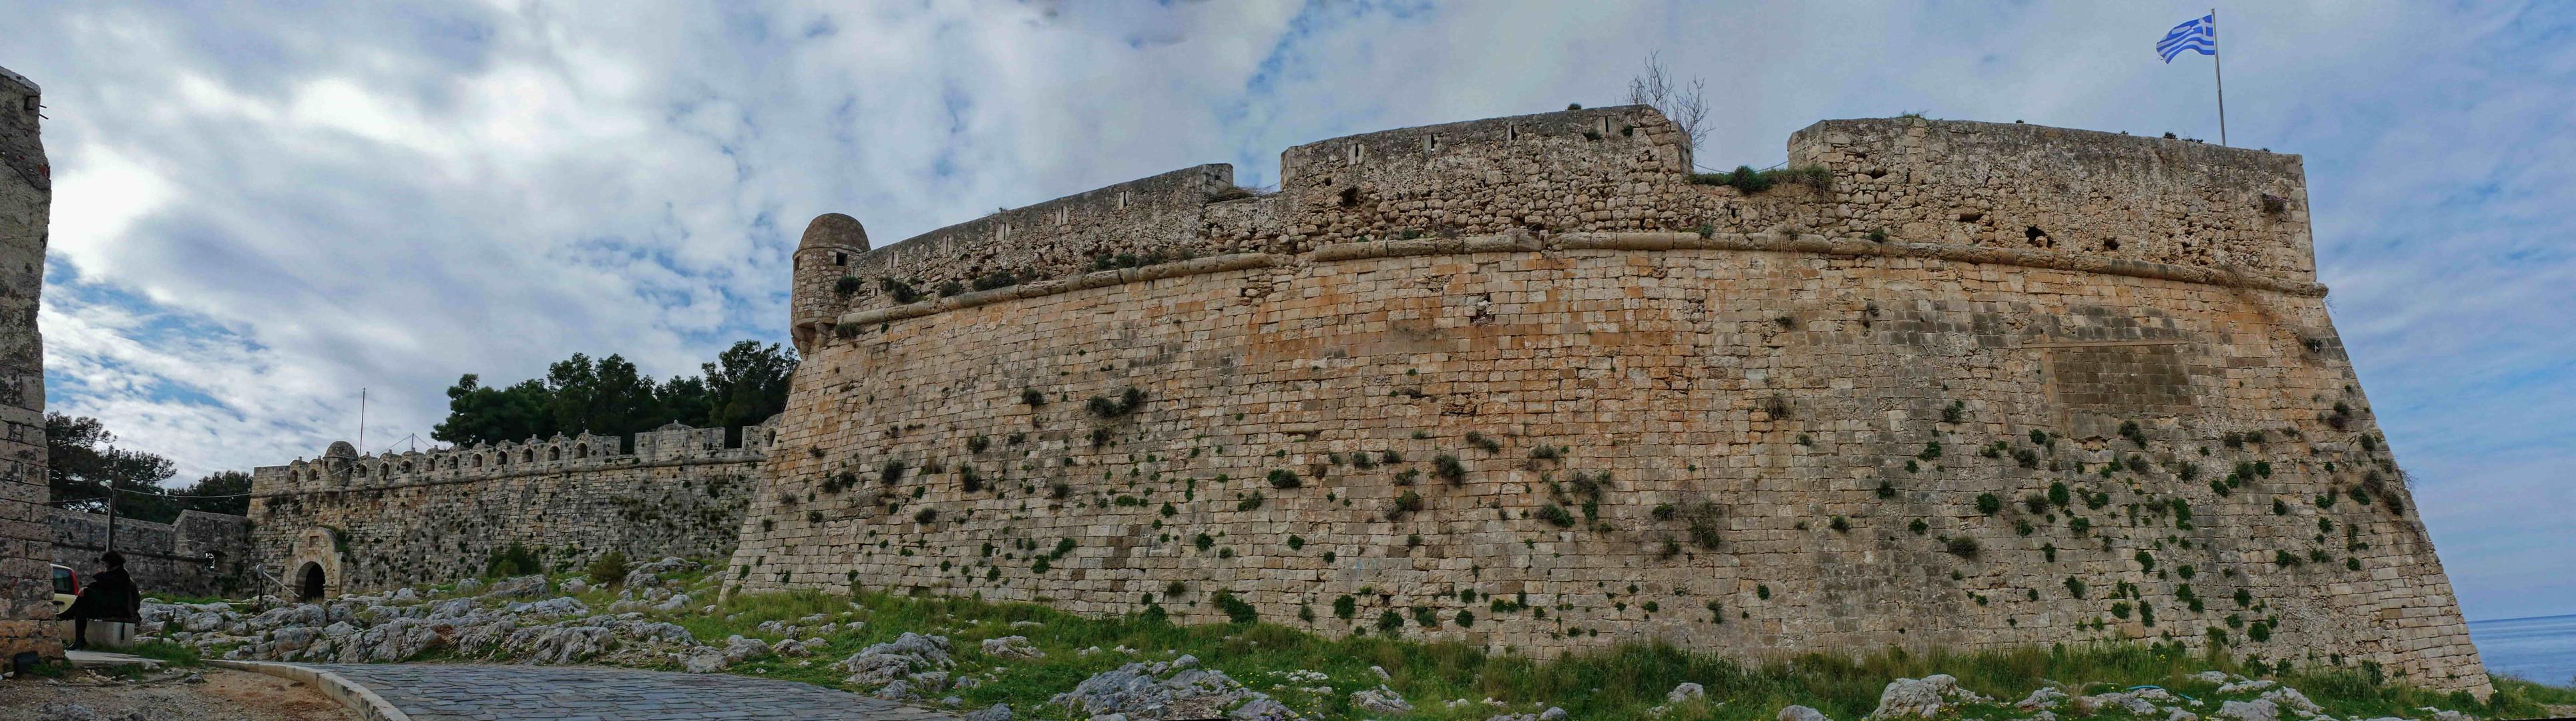 Fortezza fortress in Rethymno